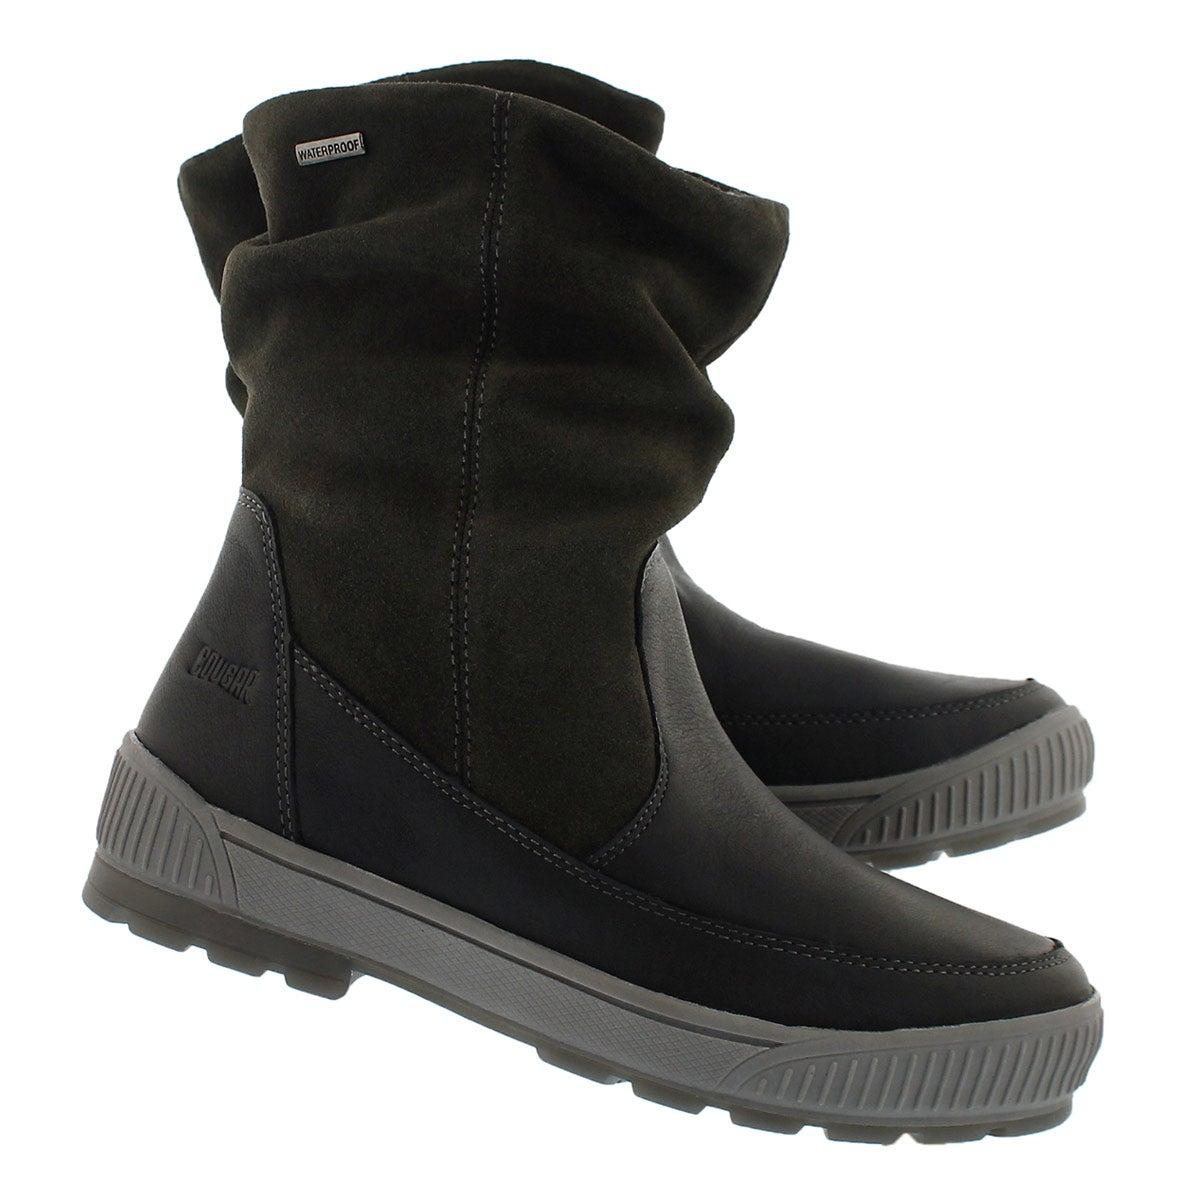 Lds Willow blk/gunmetal wtpf winter boot